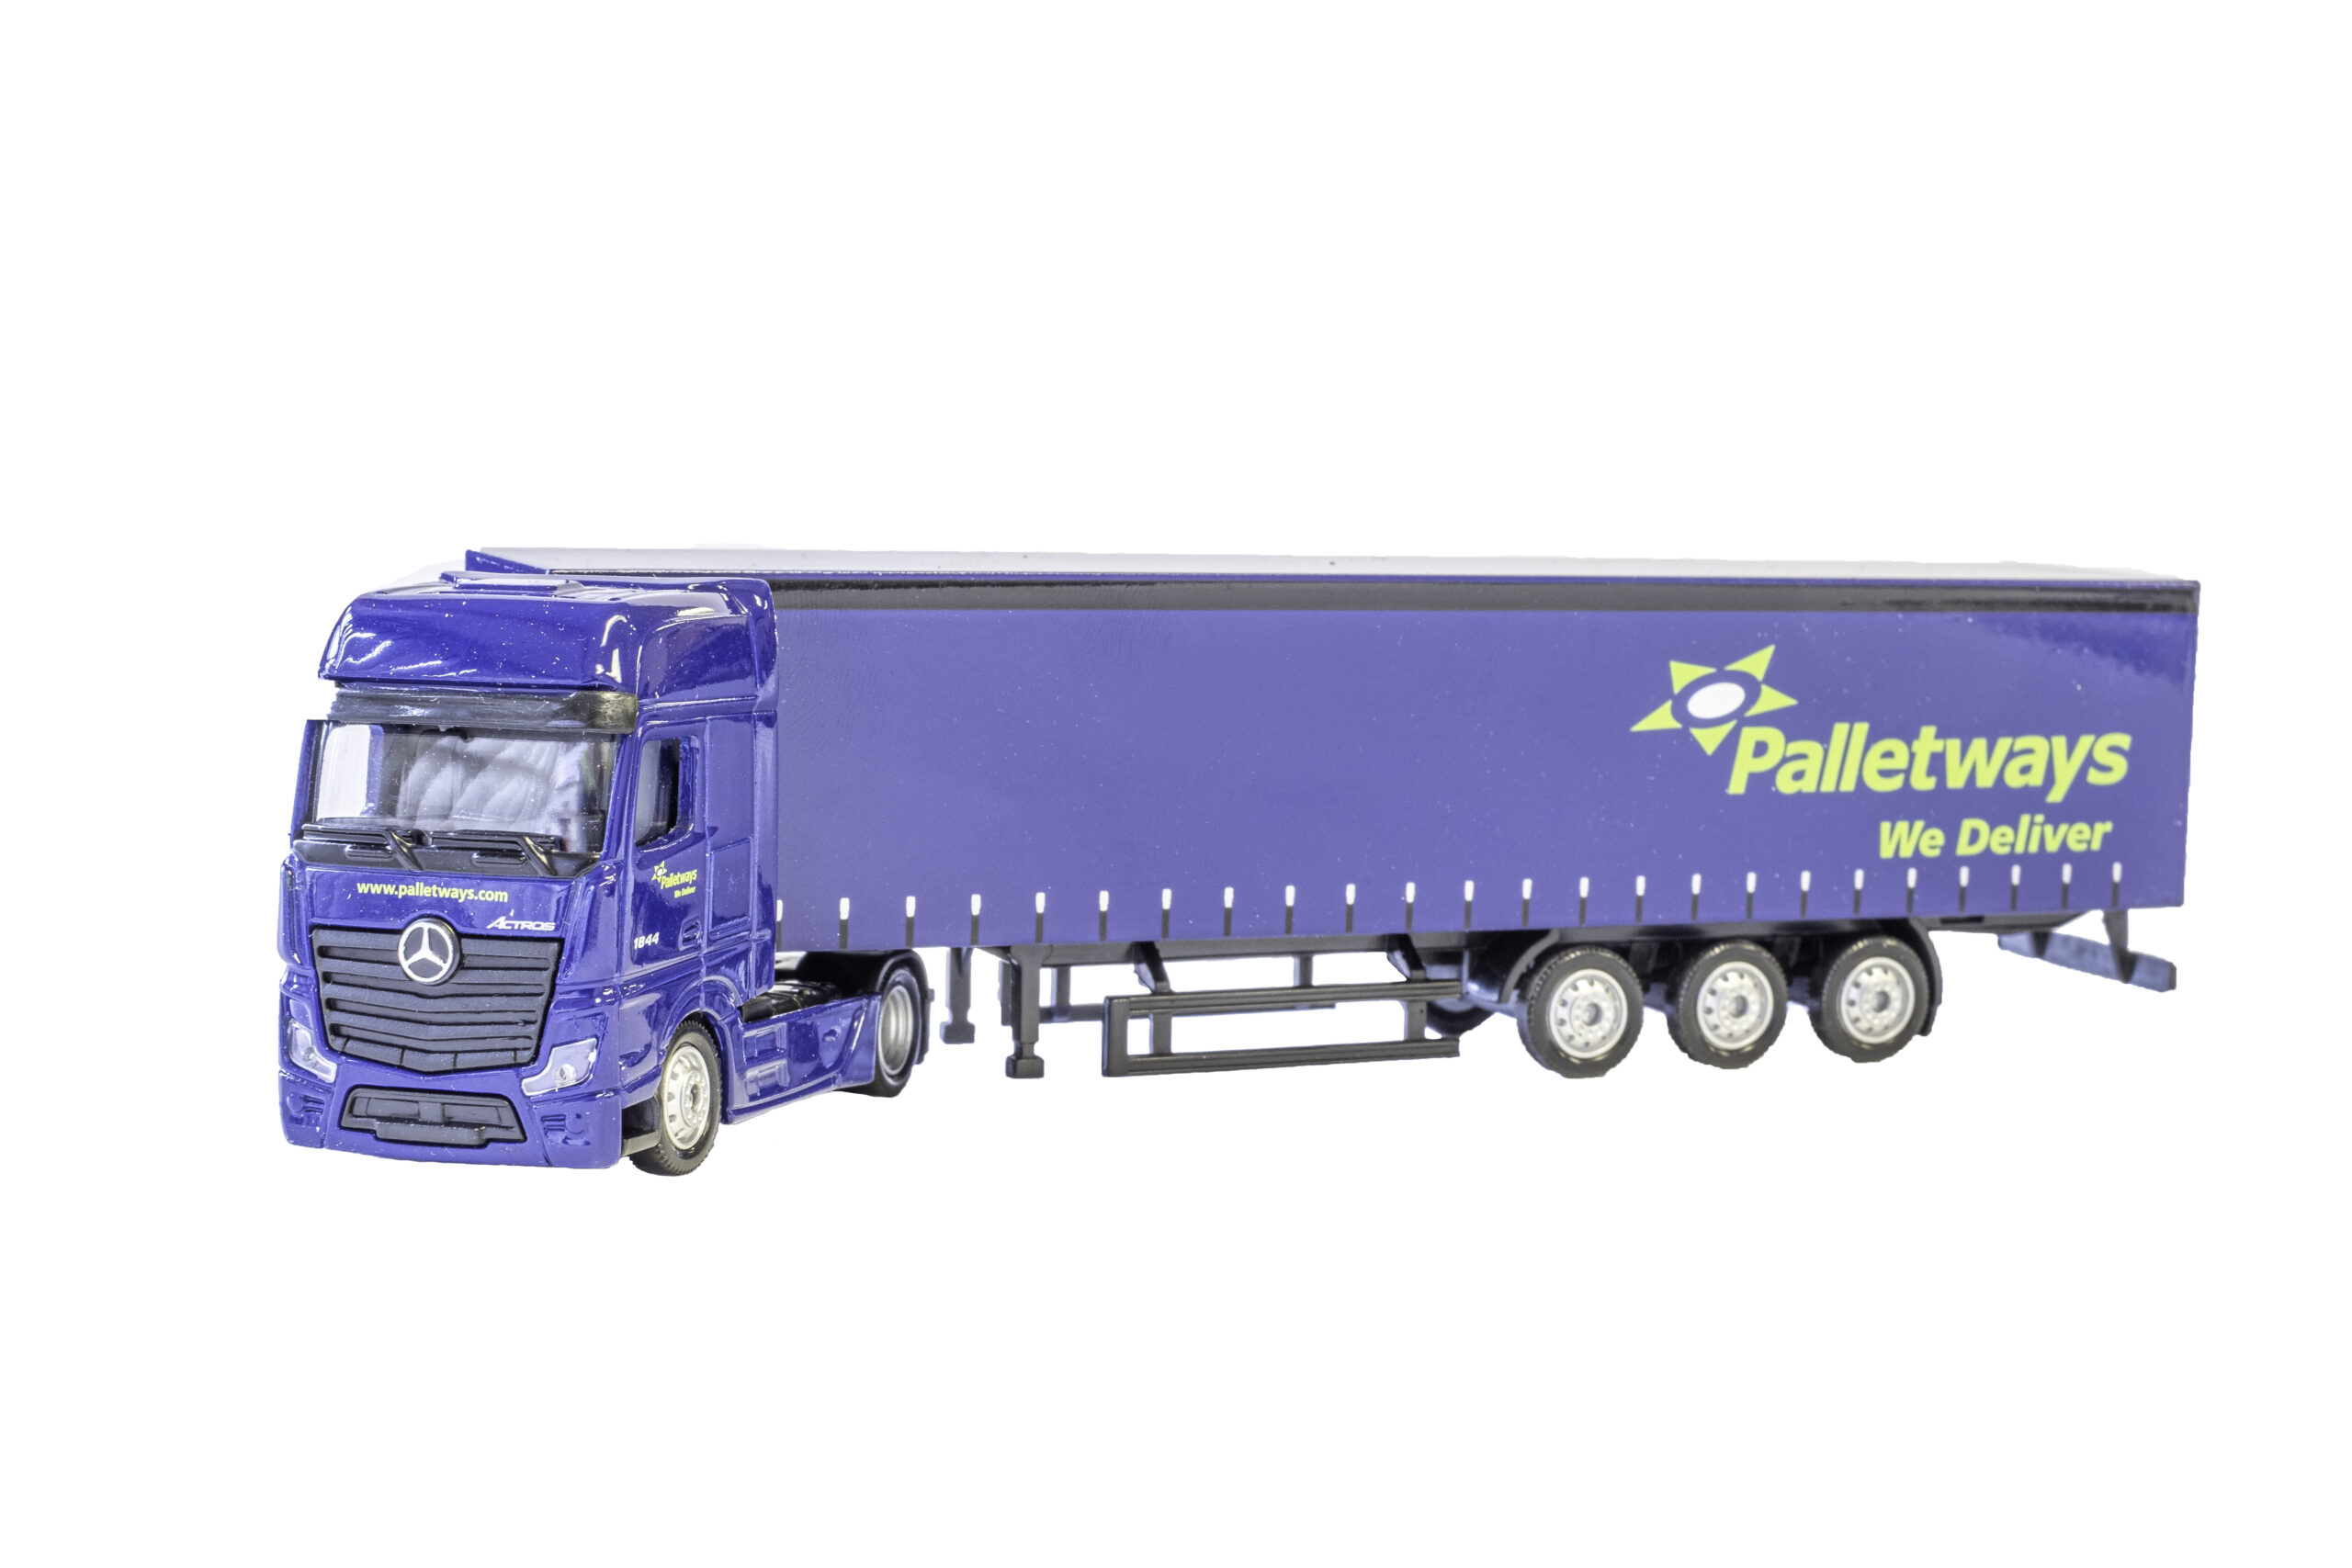 palletways-1-87-model-scaled